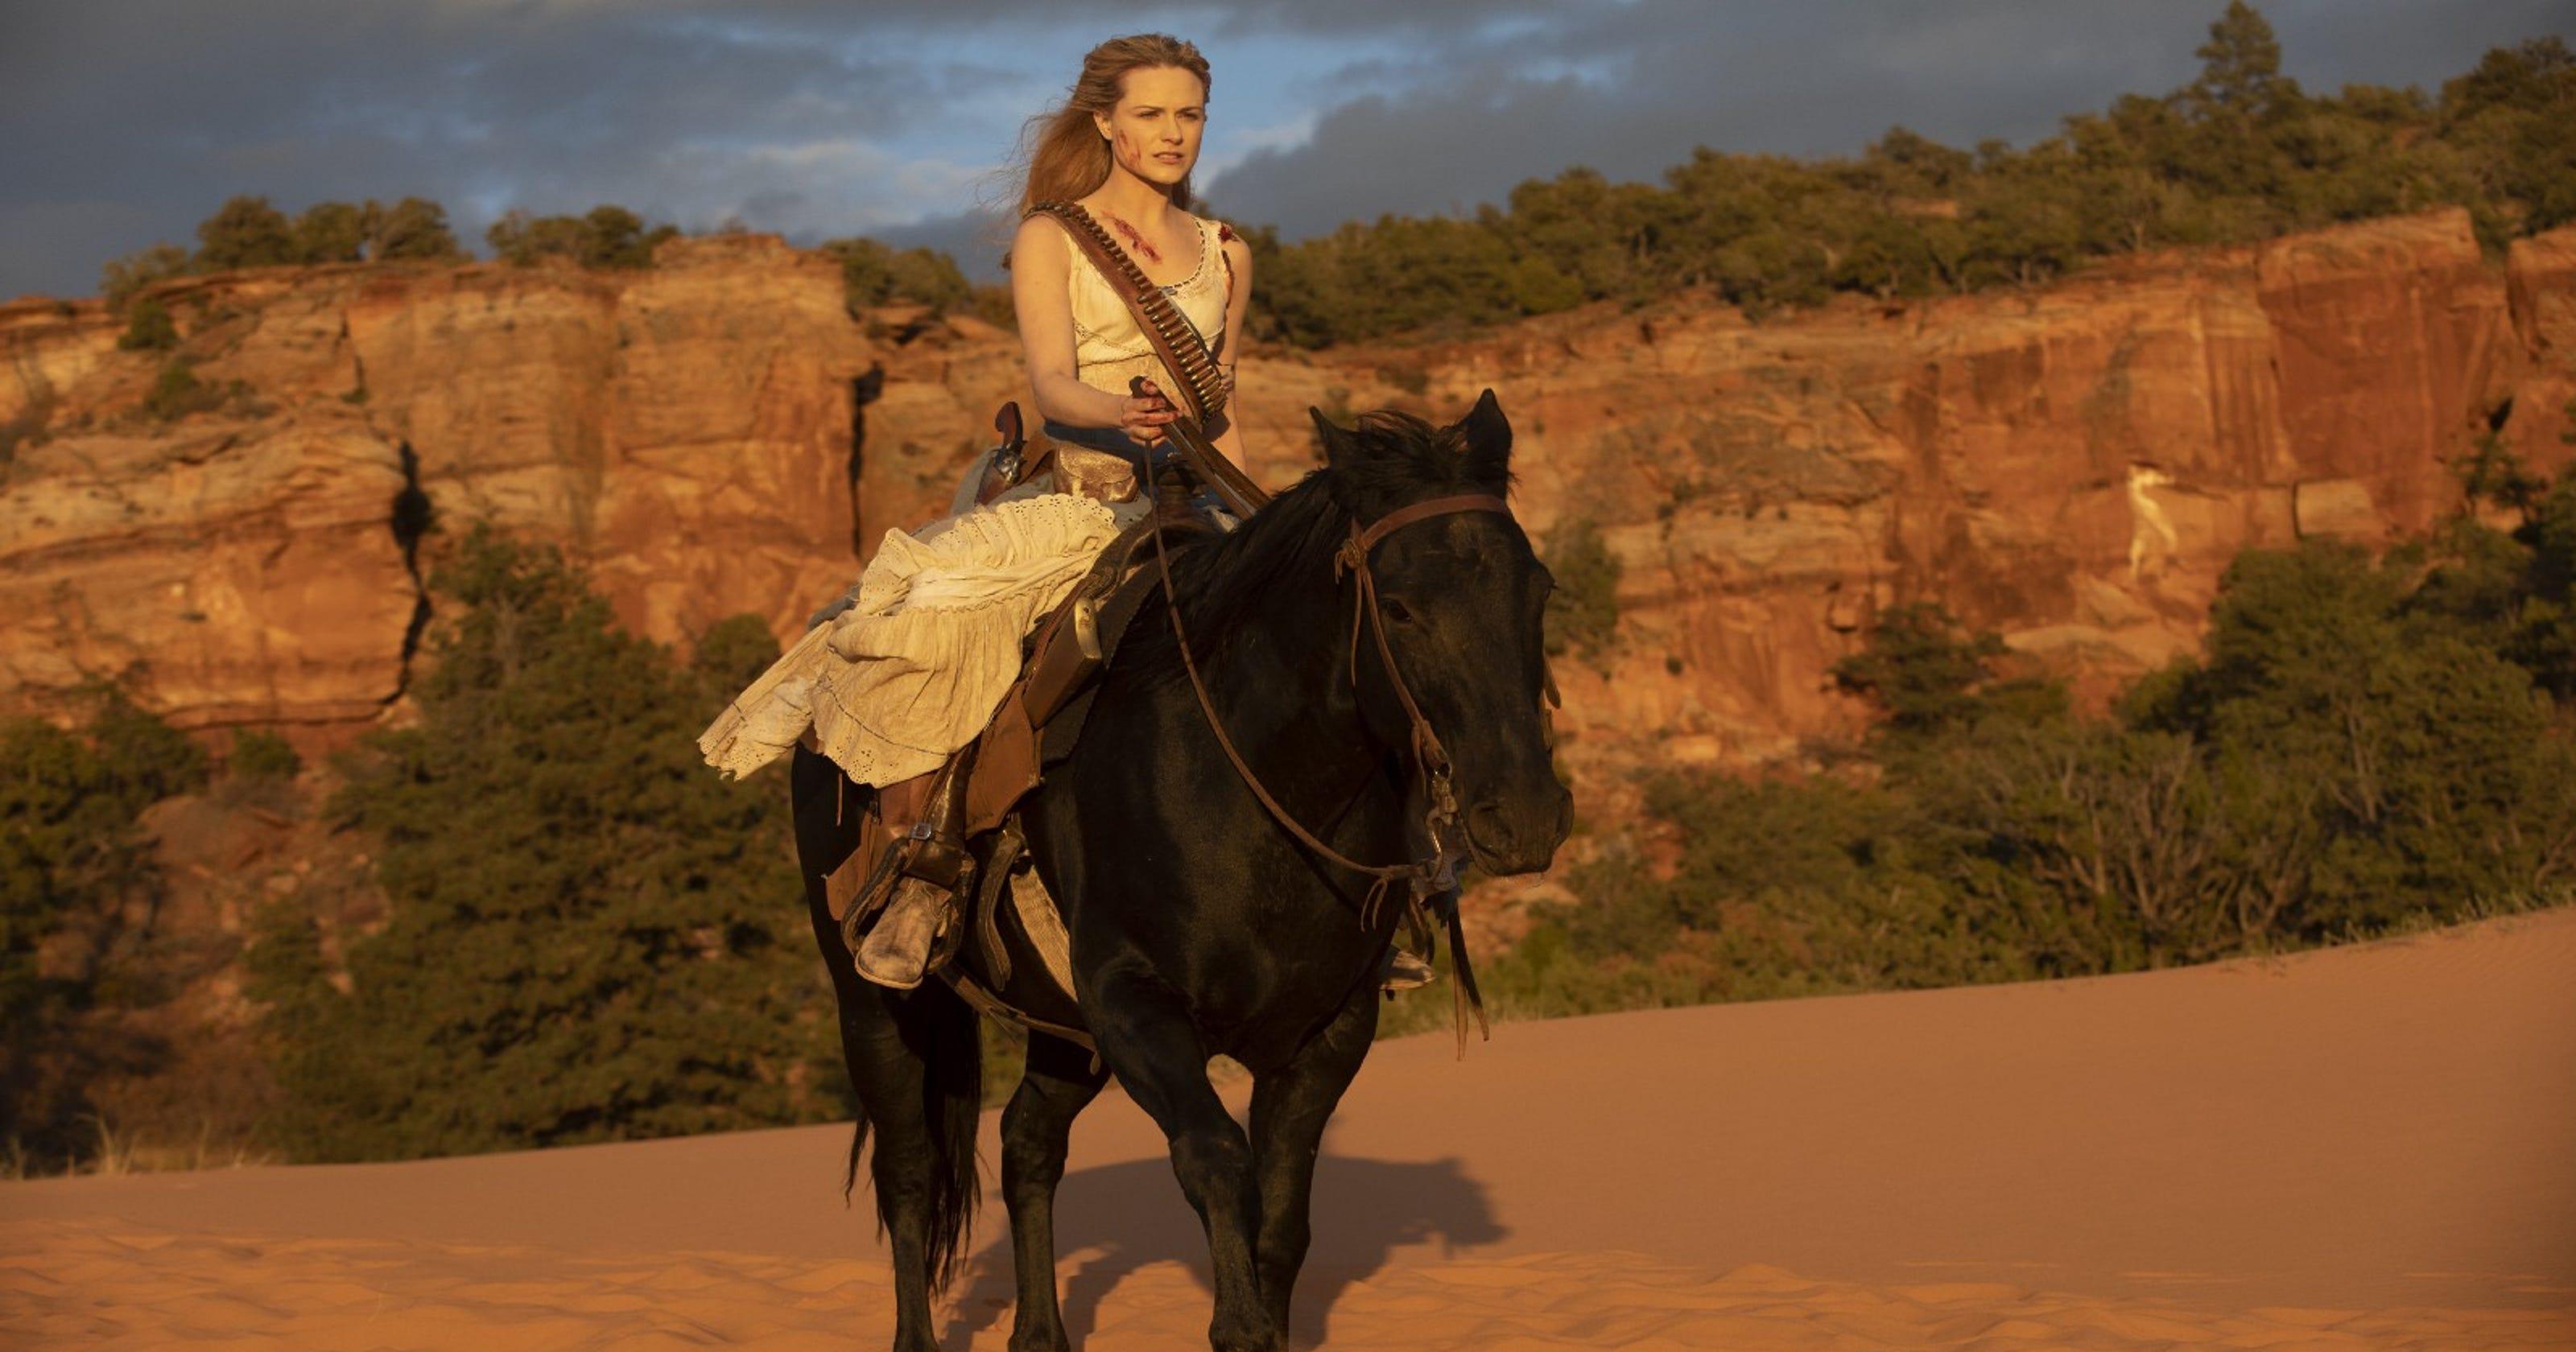 Westworld' recap: Season 2 finale, Episode 10, 'The Passenger'